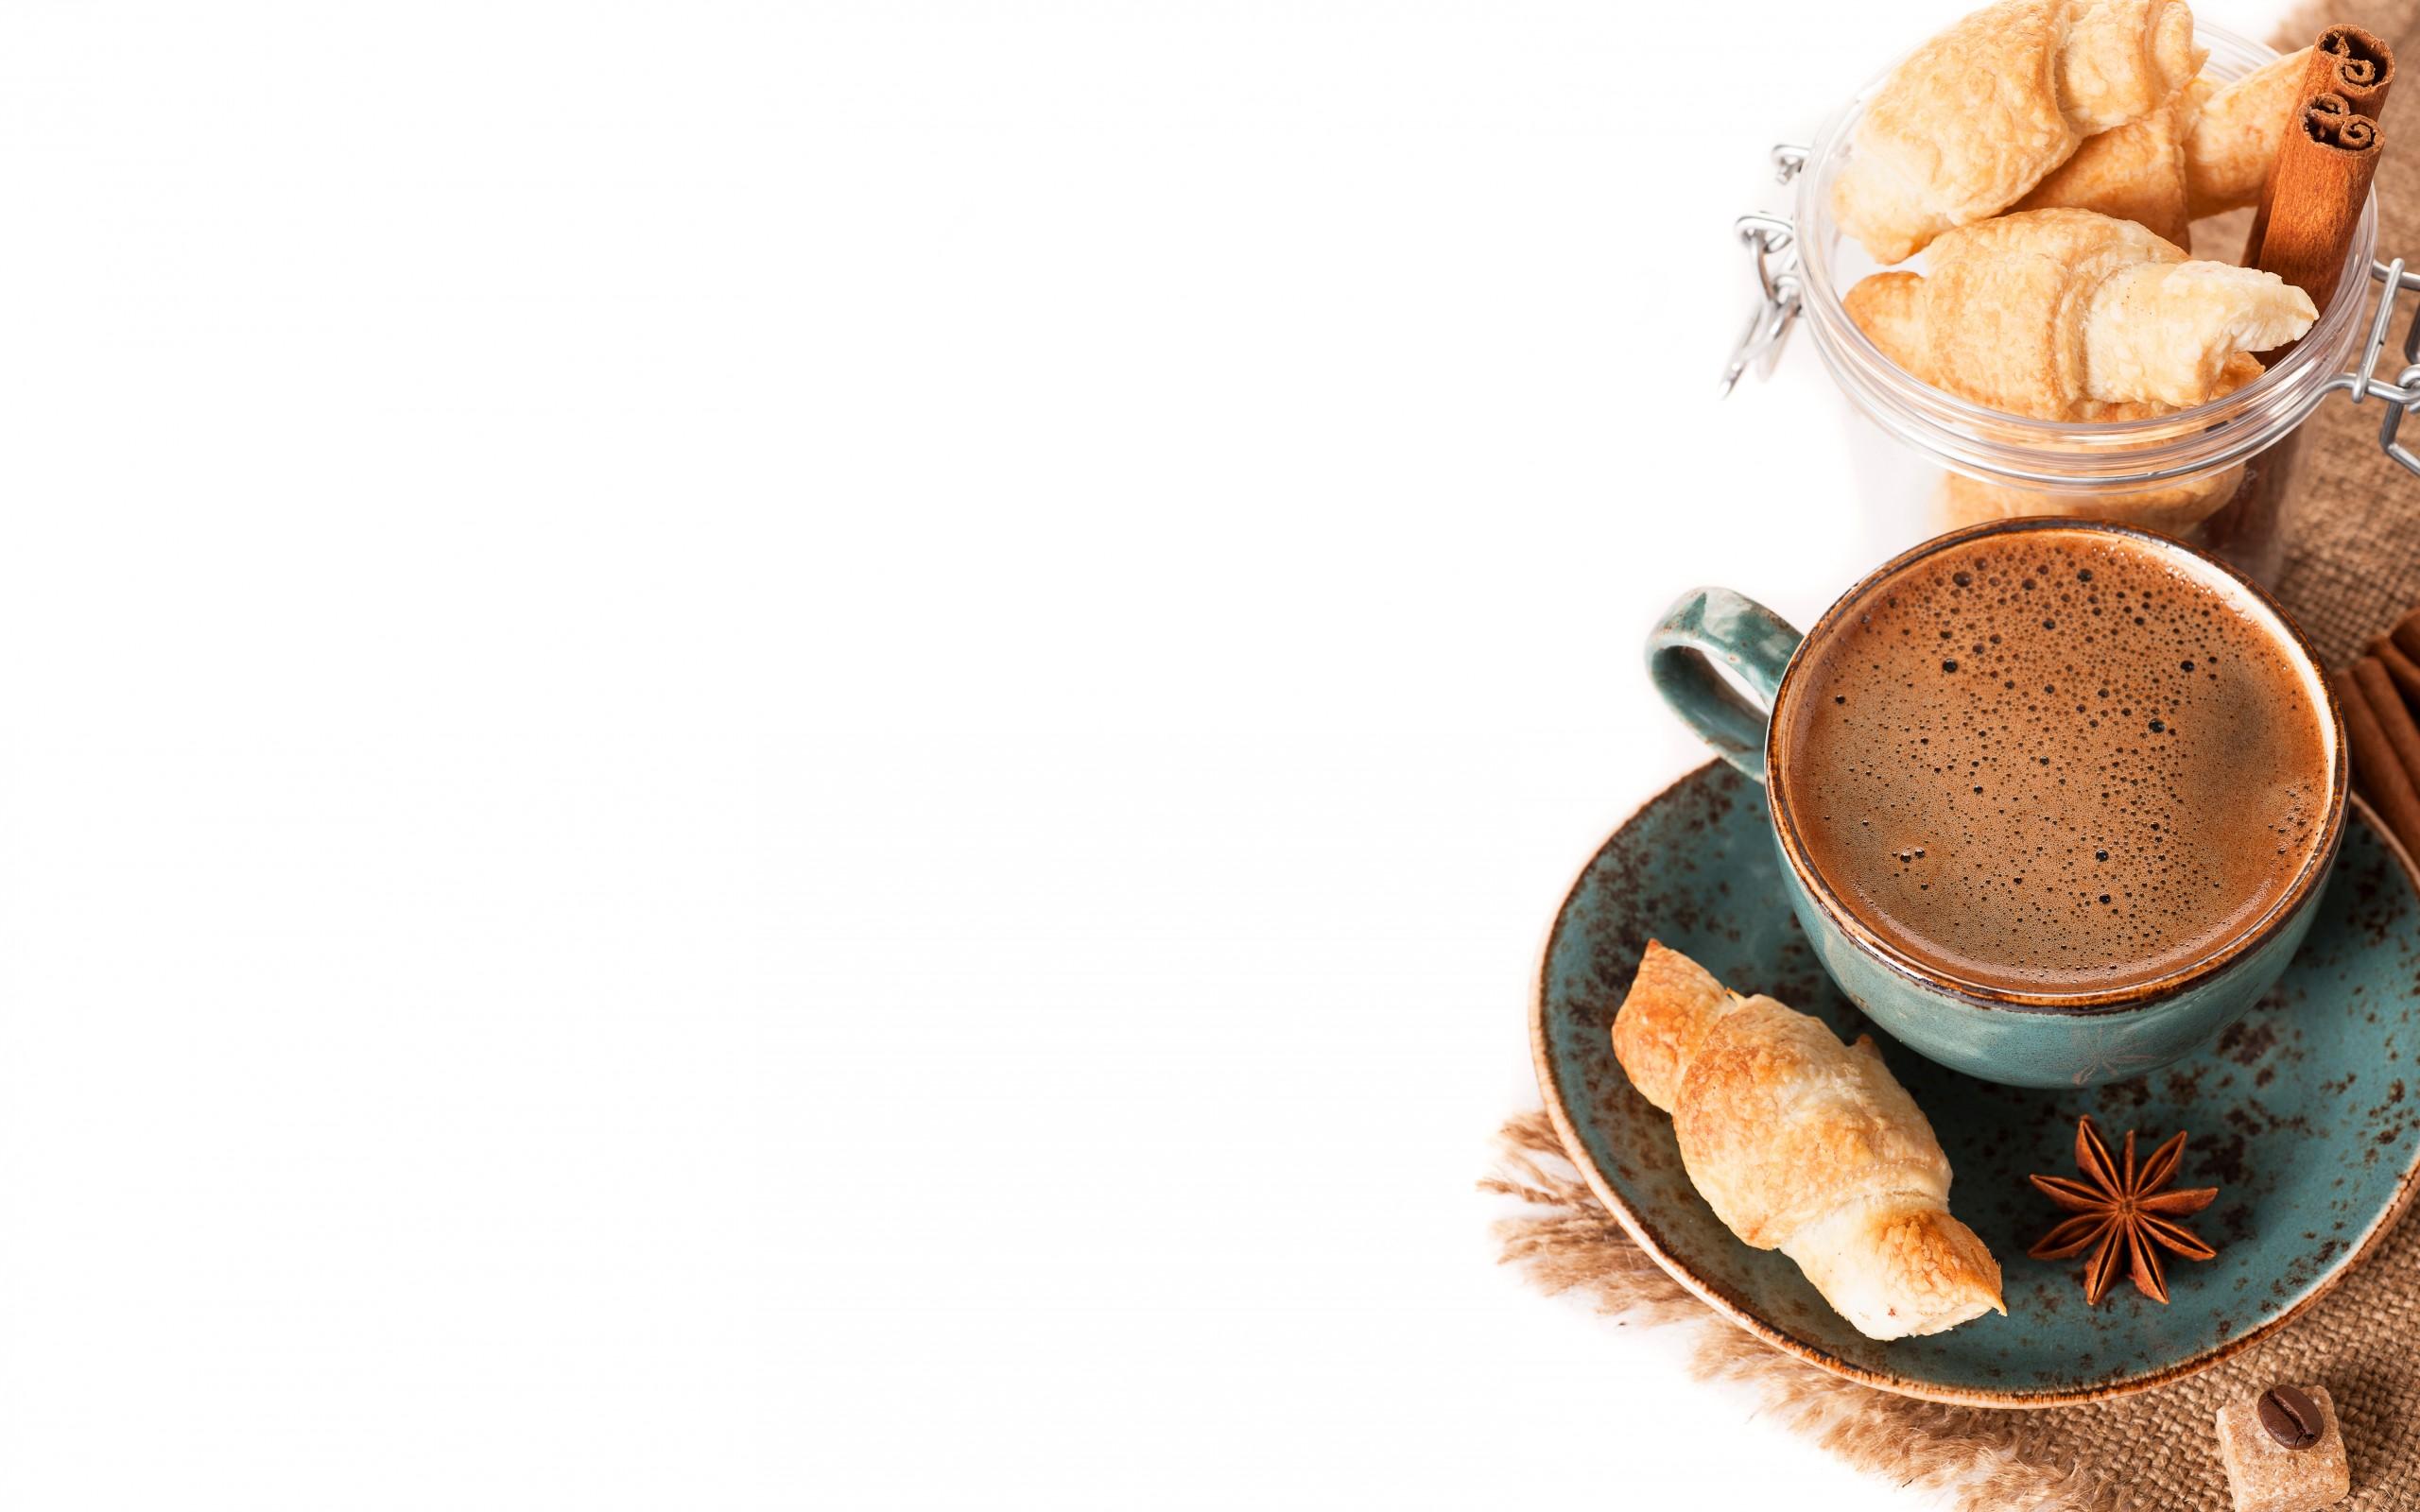 food coffee wallpaper - photo #9